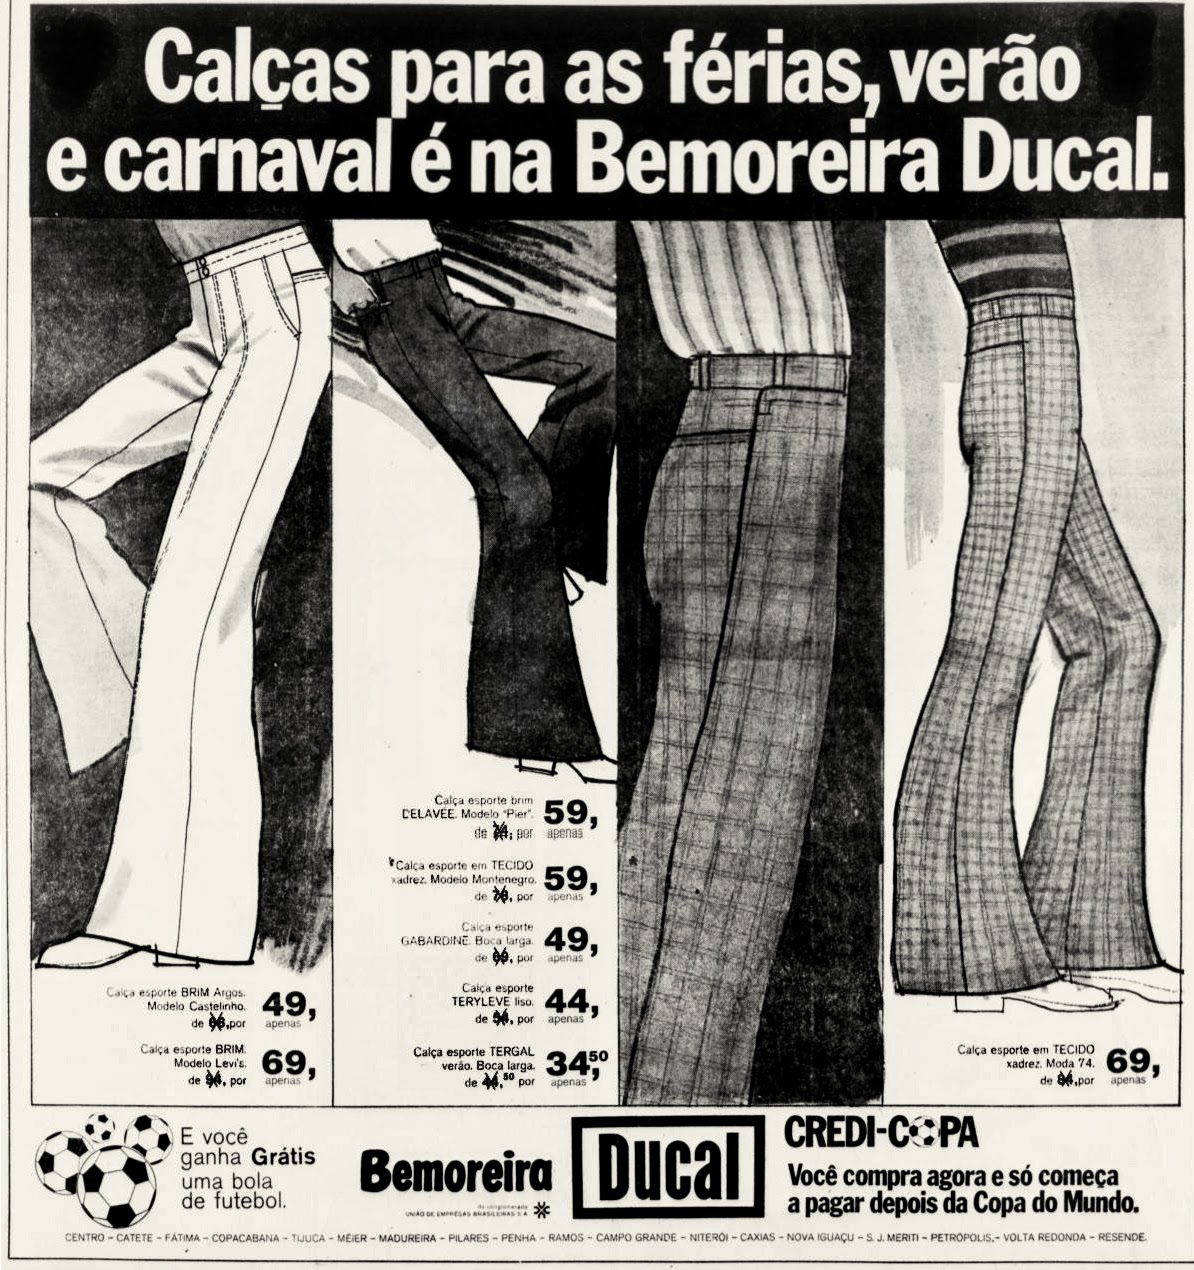 nos 70.  1974. década de 70. os anos 70; propaganda na década de 70; Brazil in the 70s, história anos 70; Oswaldo Hernandez;